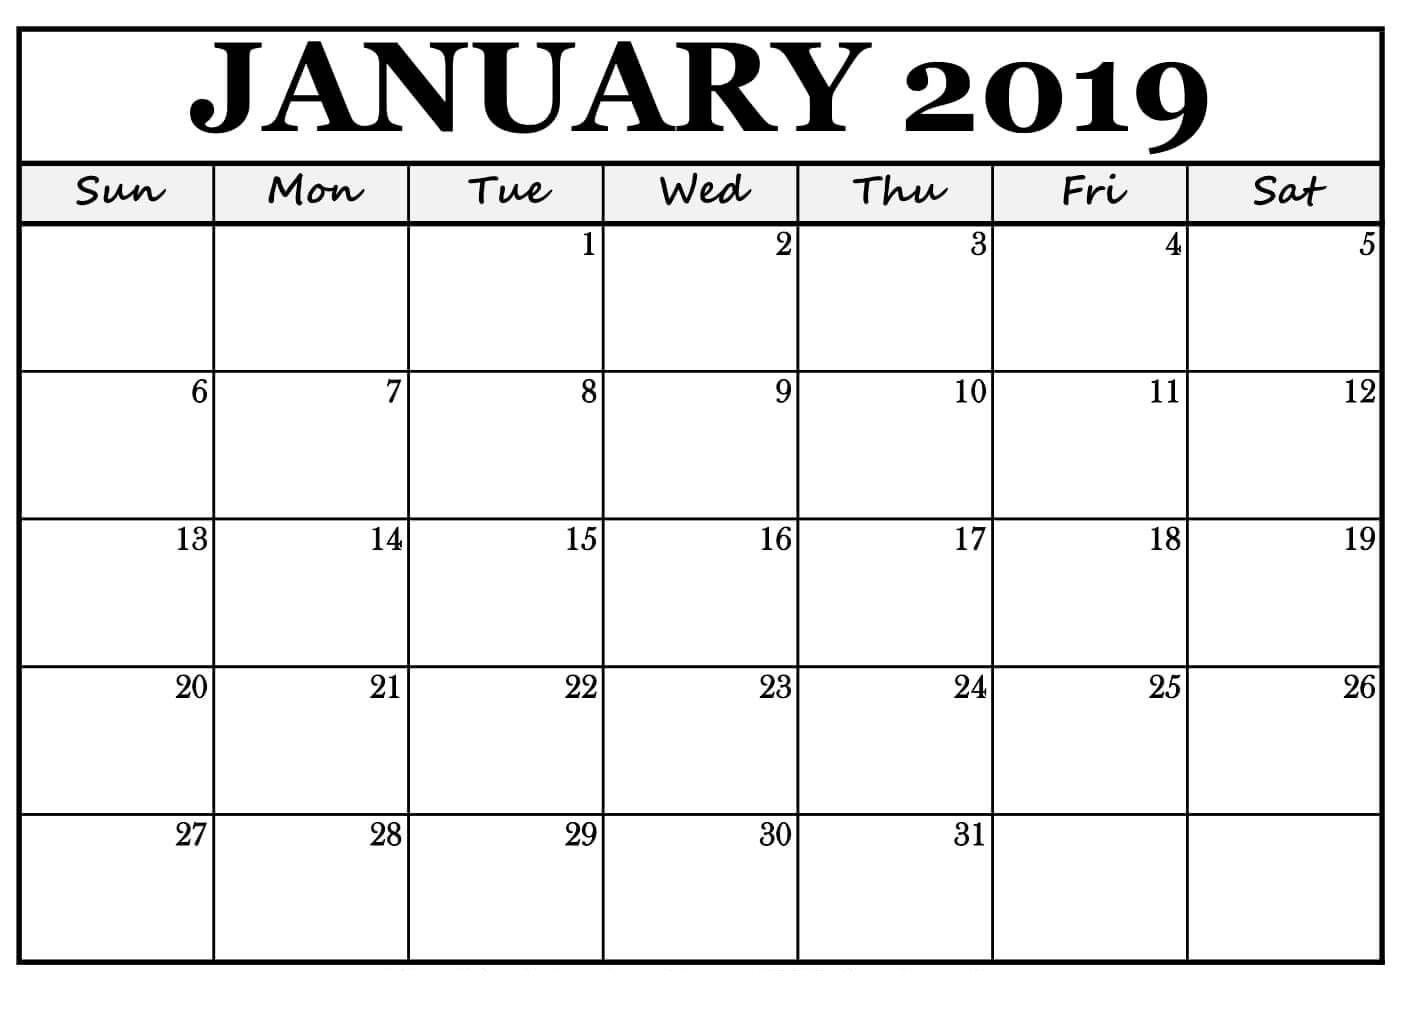 January 2019 Calendar Print January 2019 Printable Calendar Word | Free Printable January 2019